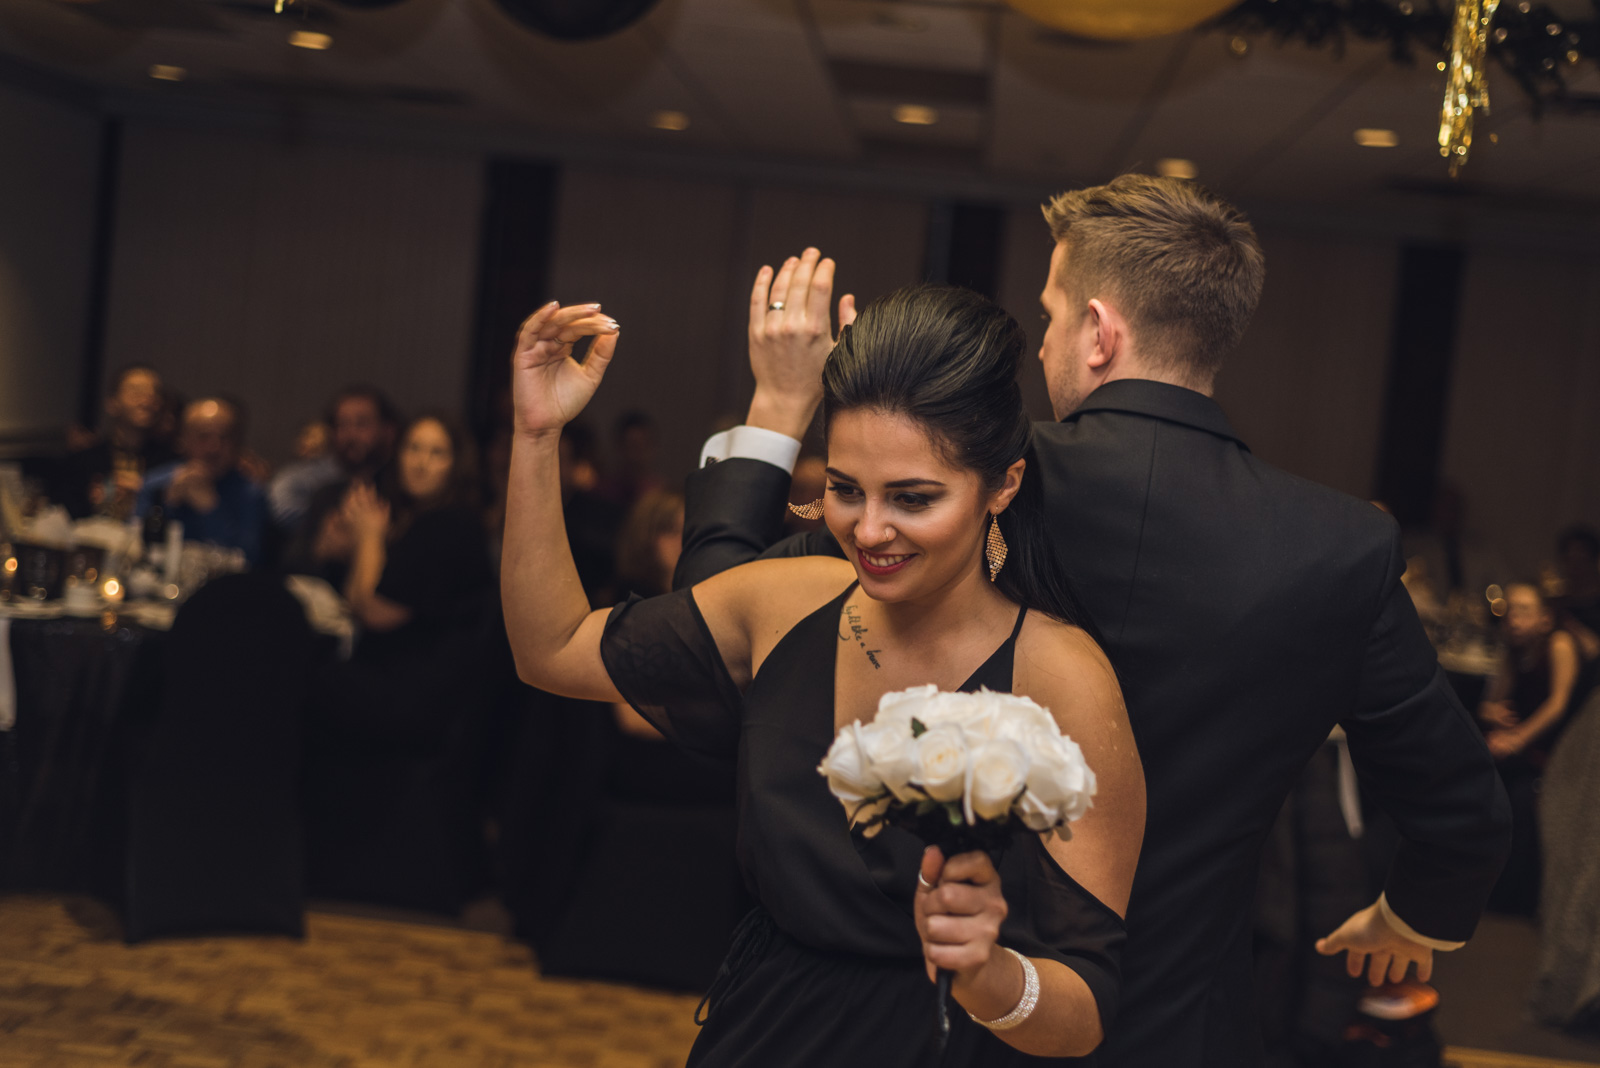 rheana-chris-wedding-blog-229.jpg